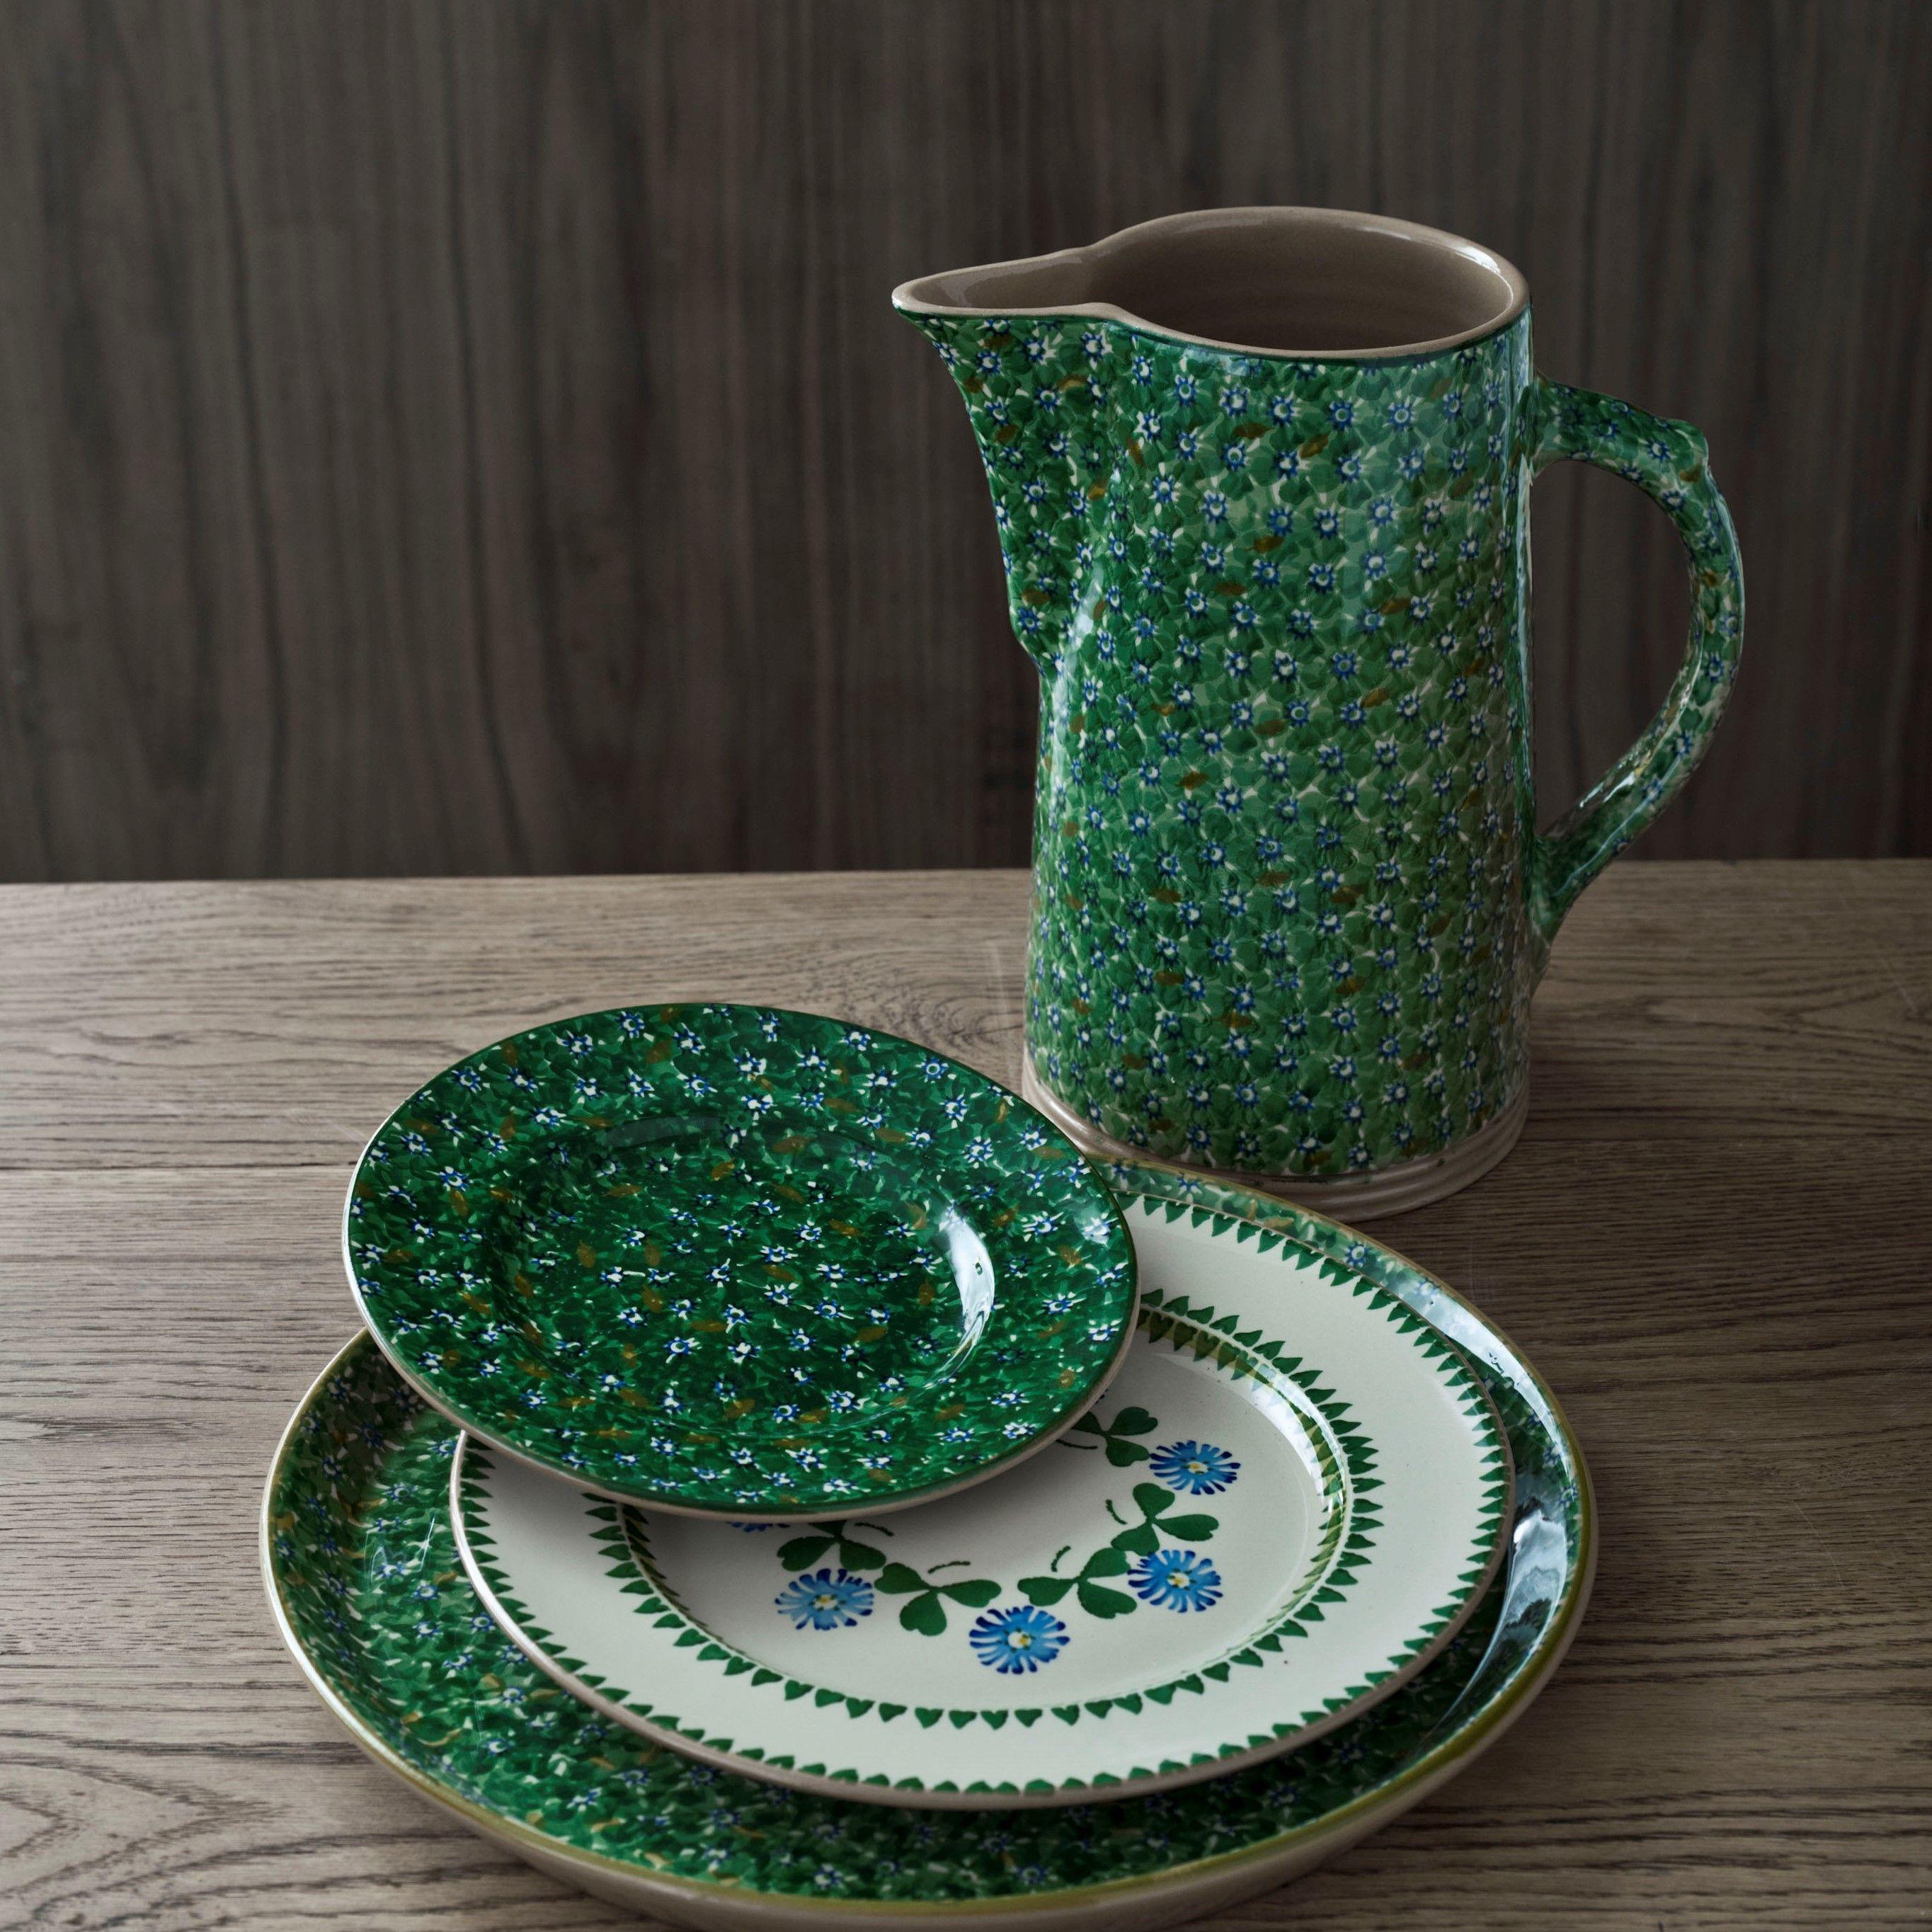 Beautiful patterns by nicholas mosse pottery ireland in